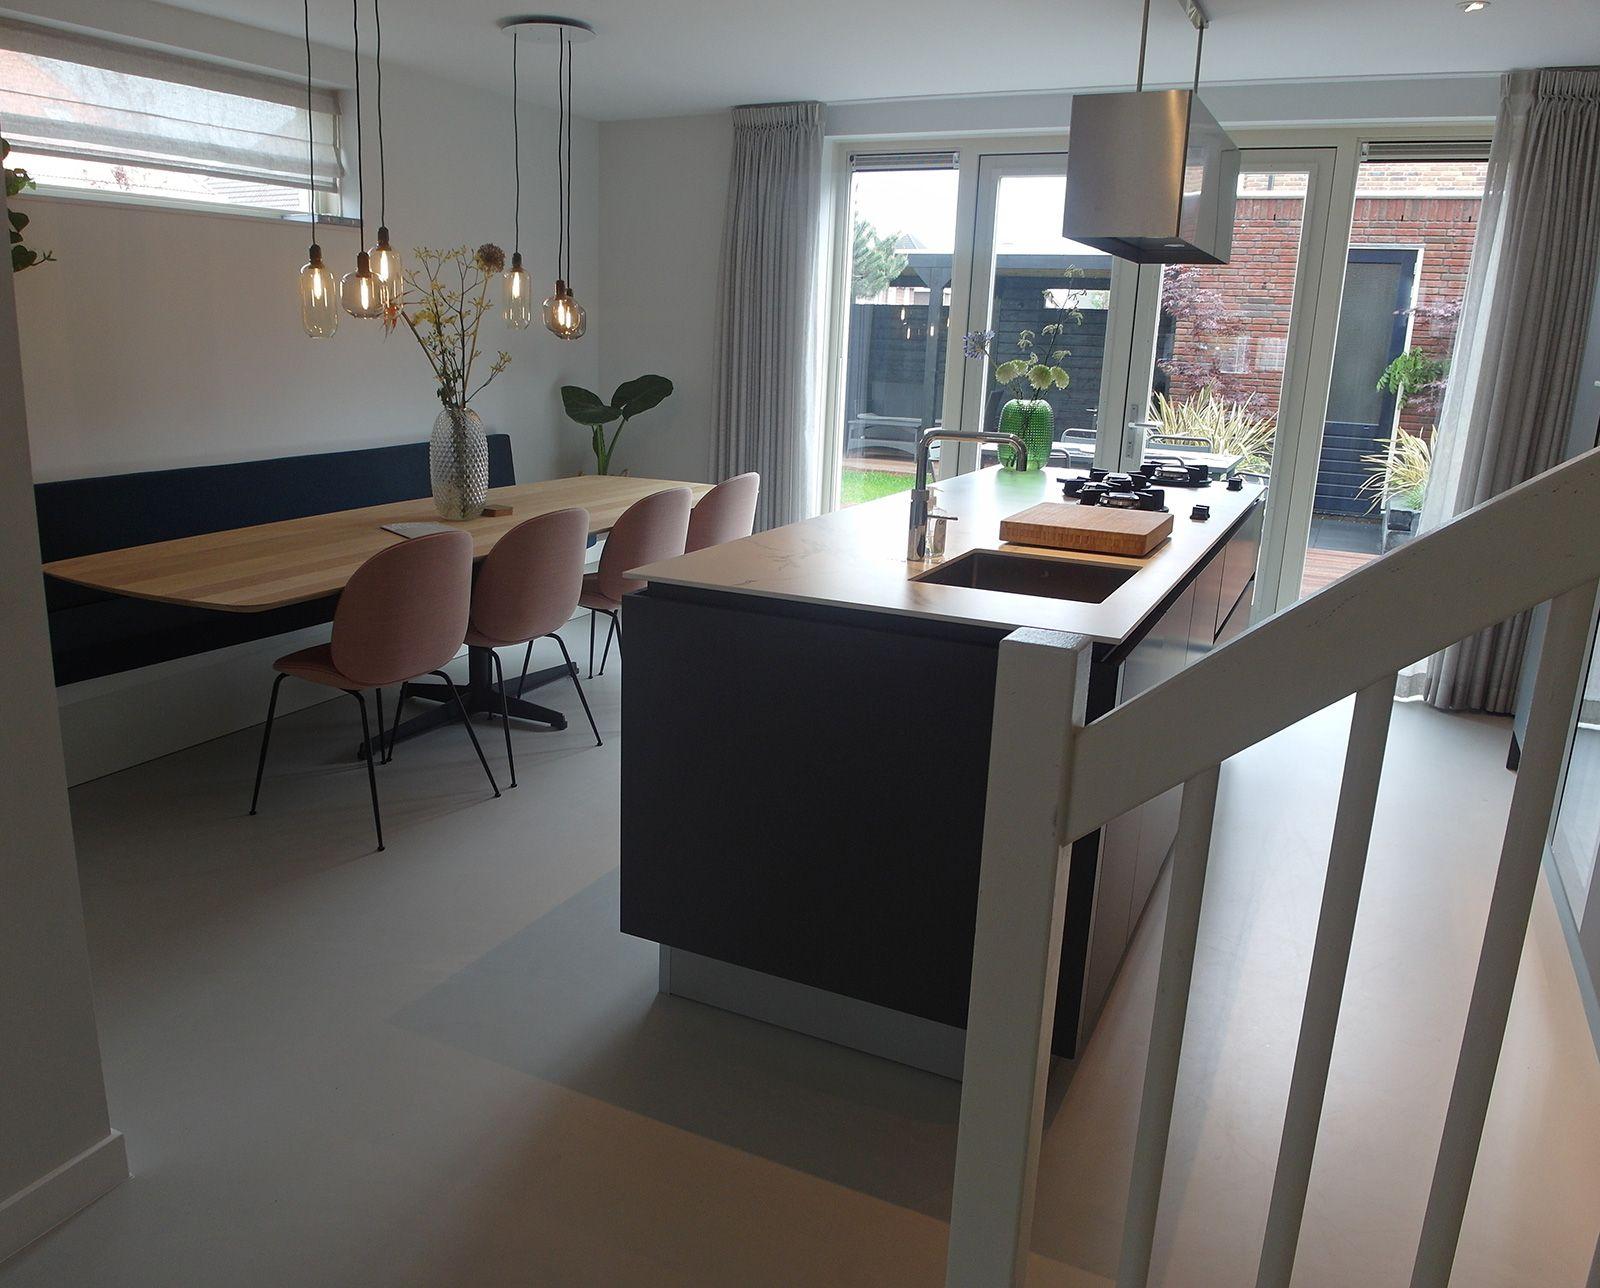 Keuken Gietvloer Marmer : Gietvloer woonkeuken in kitchen